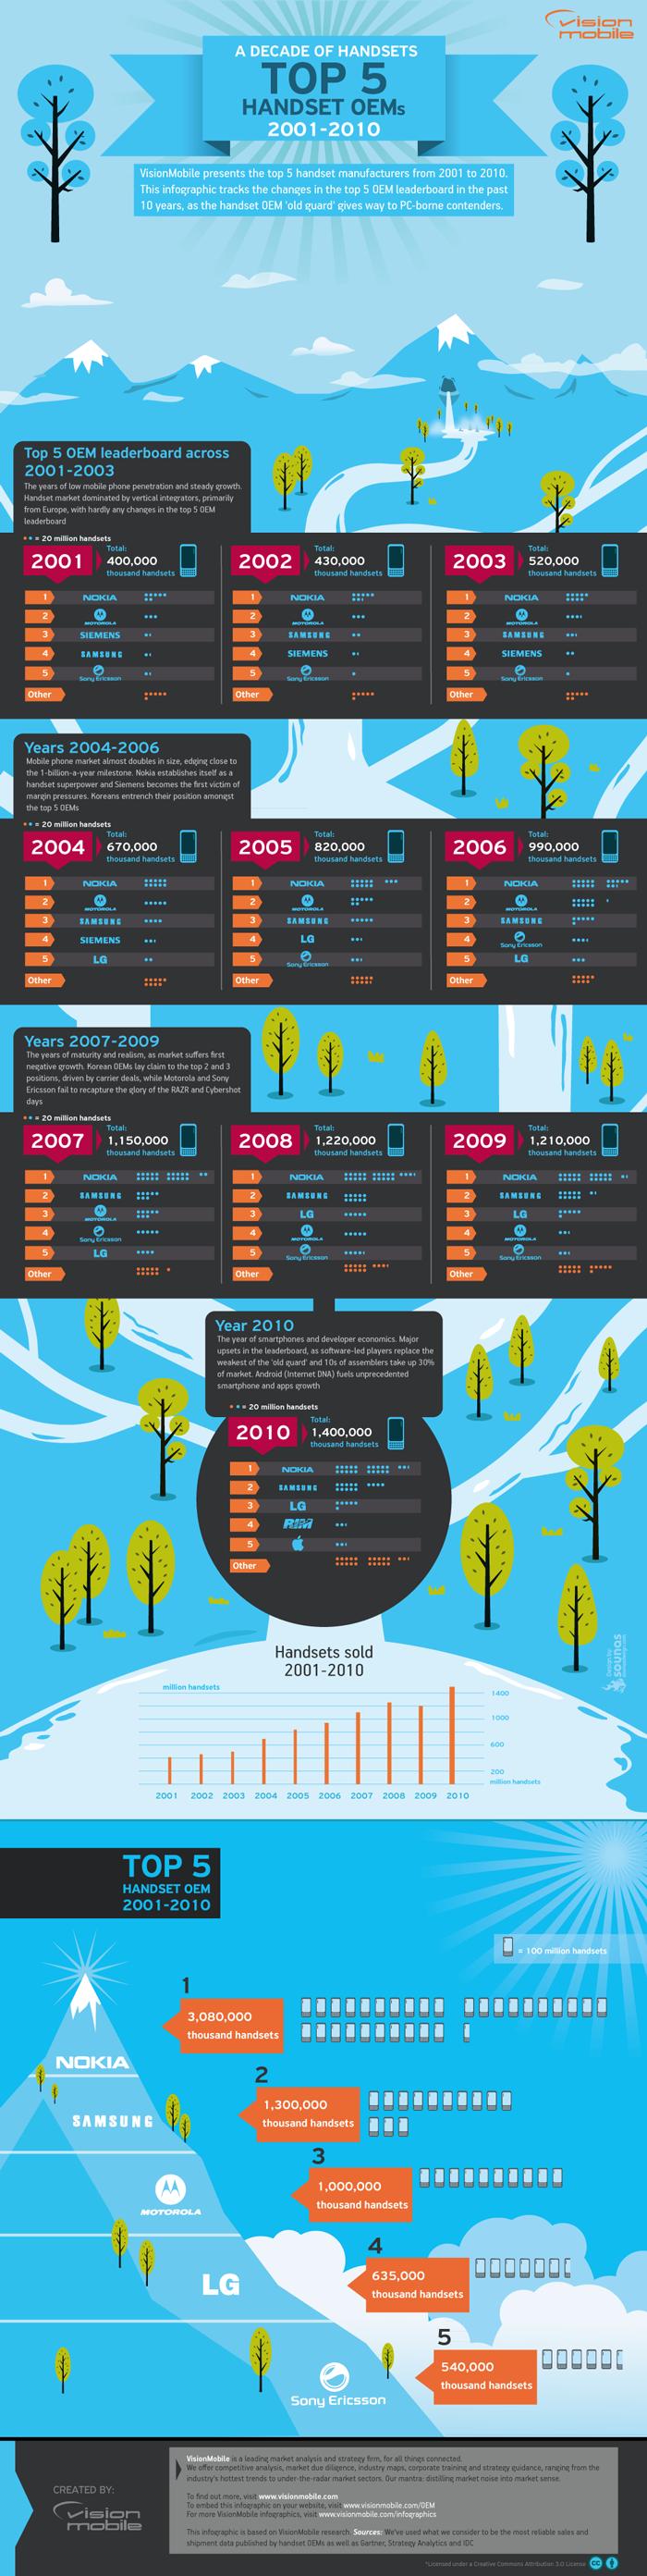 Top 5 Handset OEMs (2001-2010) – 国外信息图表设计案例精选